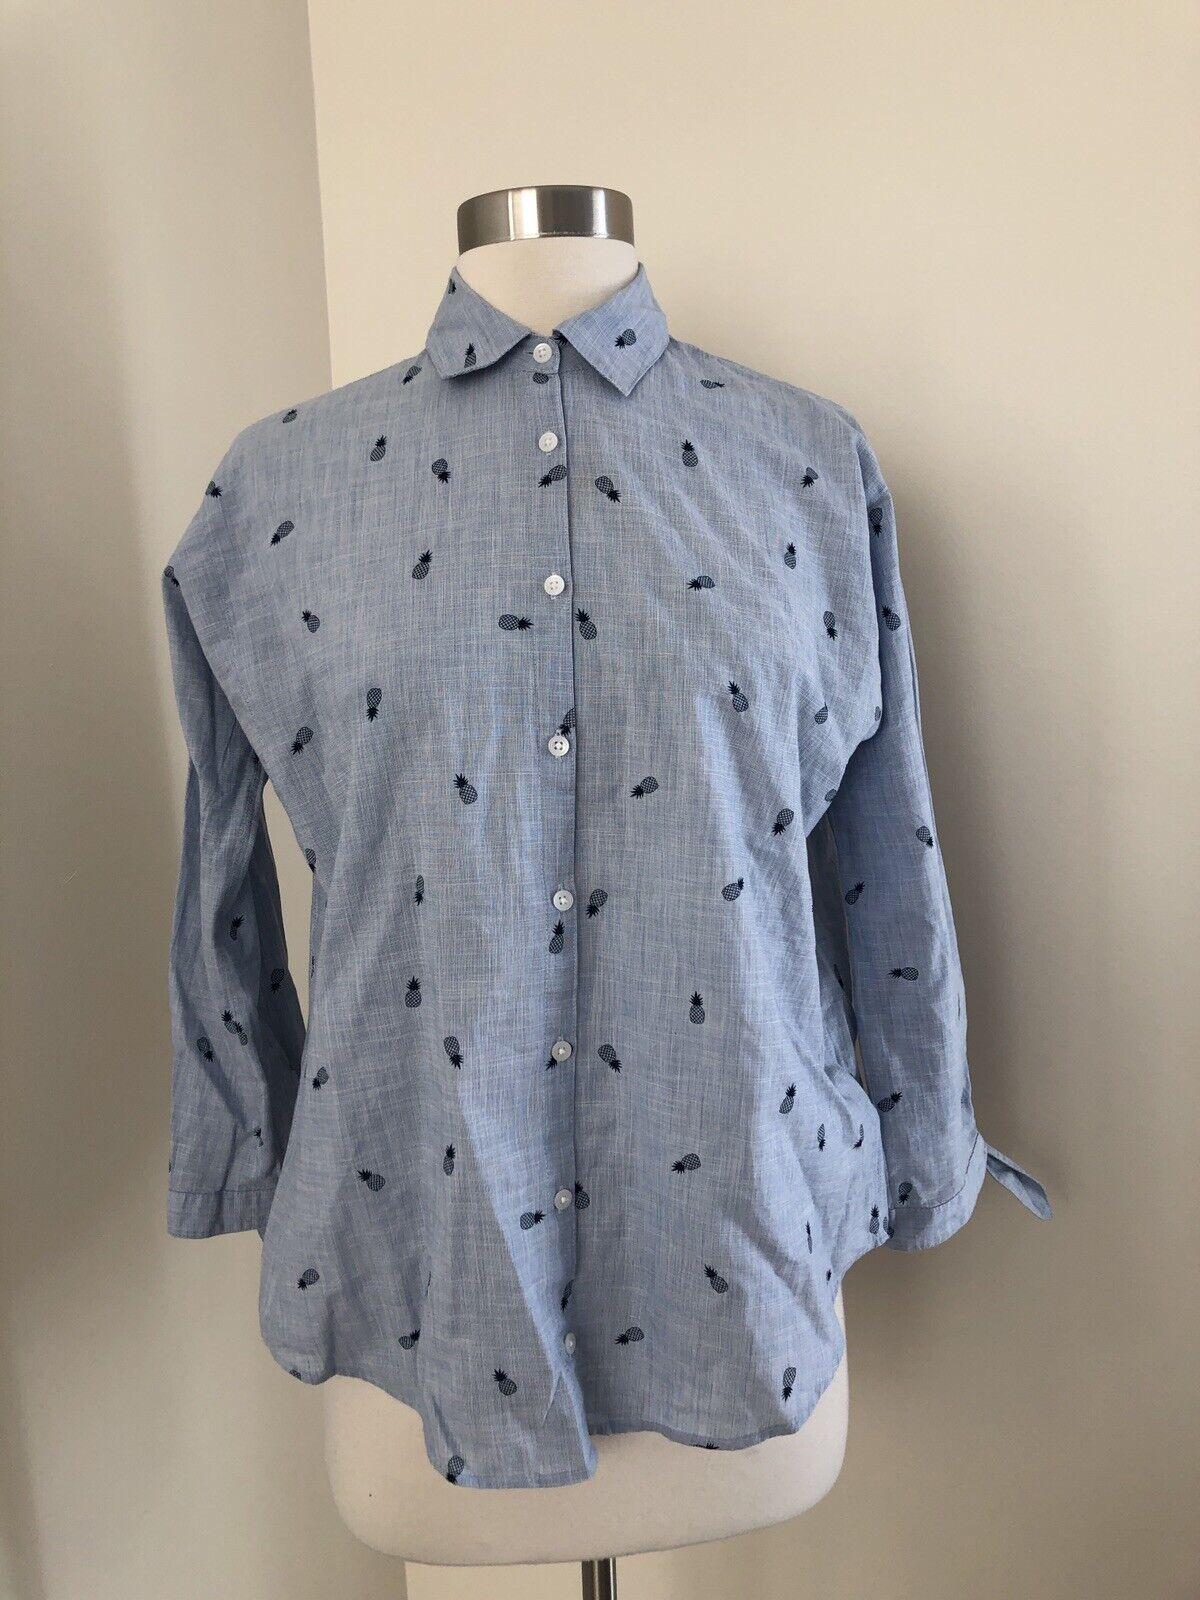 New Madewell Shrunken Trapeze Shirt in Pineapple Print Blau G4896 XXS